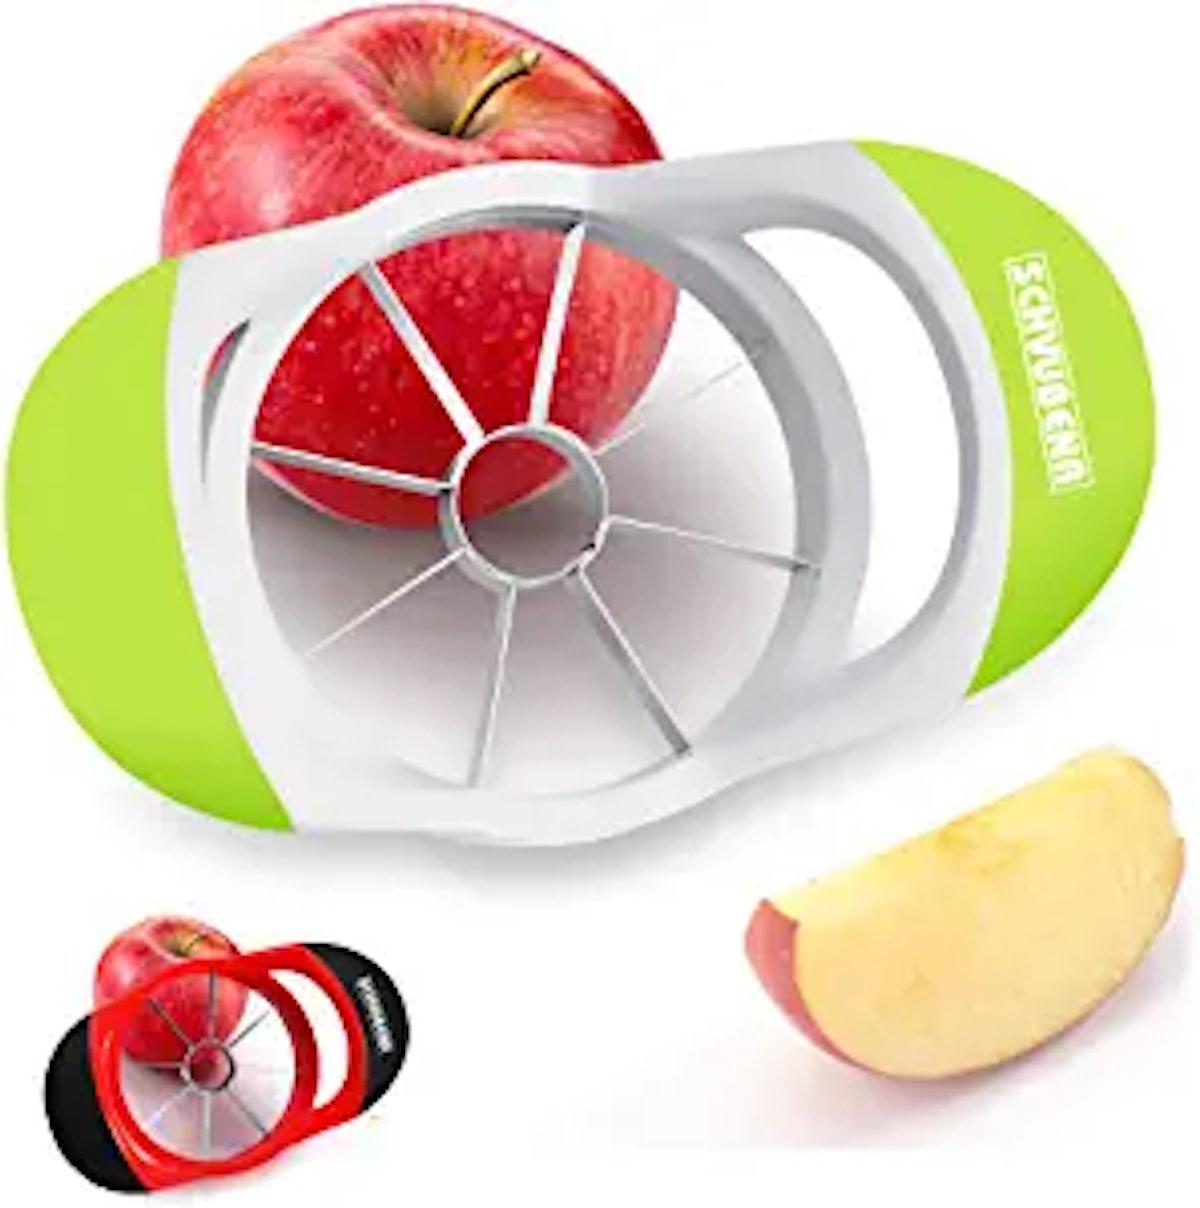 SCHVUBENR Professional Apple Slicer (3.5 Inch)